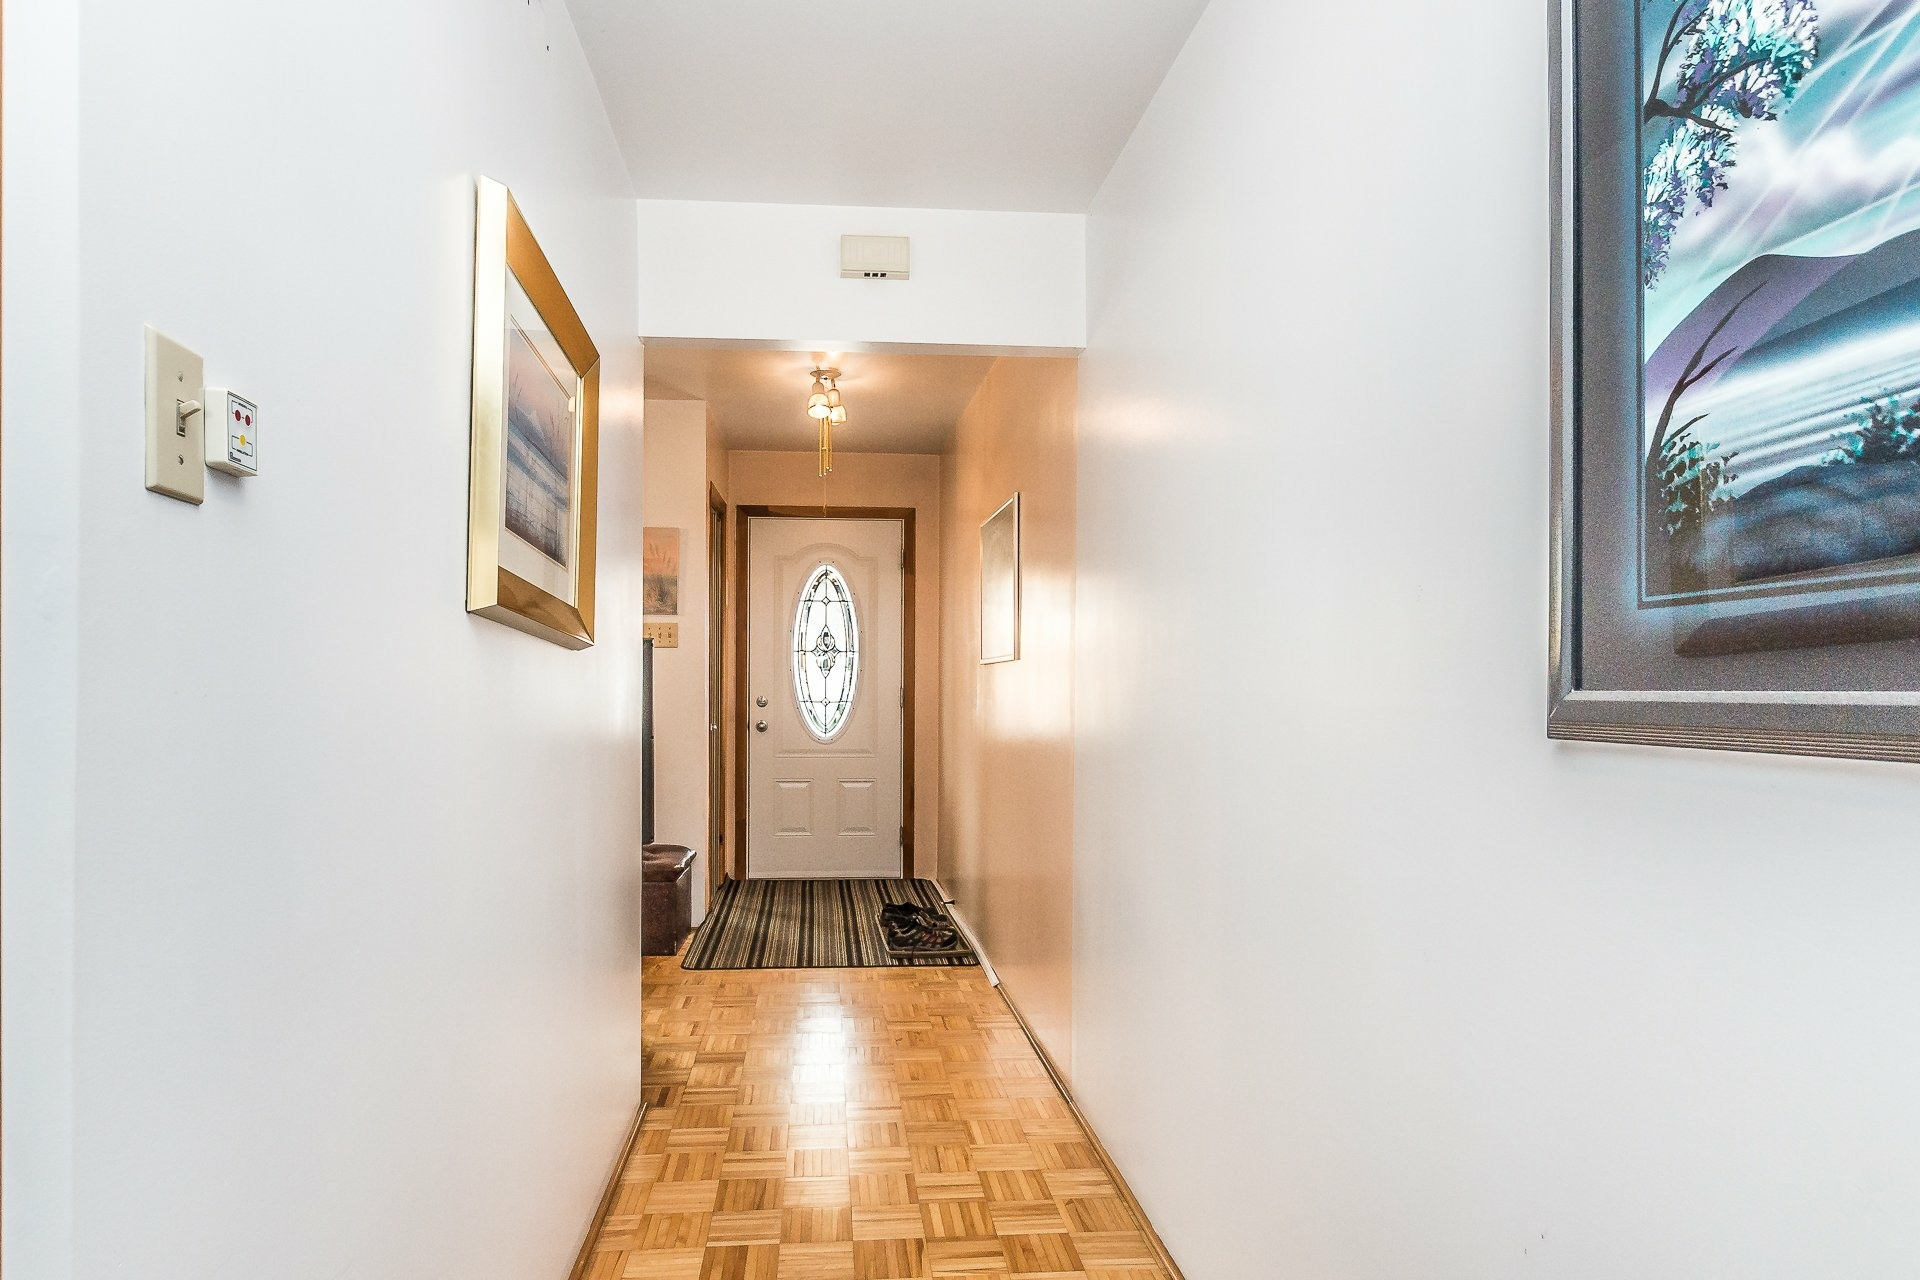 image 9 - Duplex En venta Montréal Lachine  - 3 habitaciones